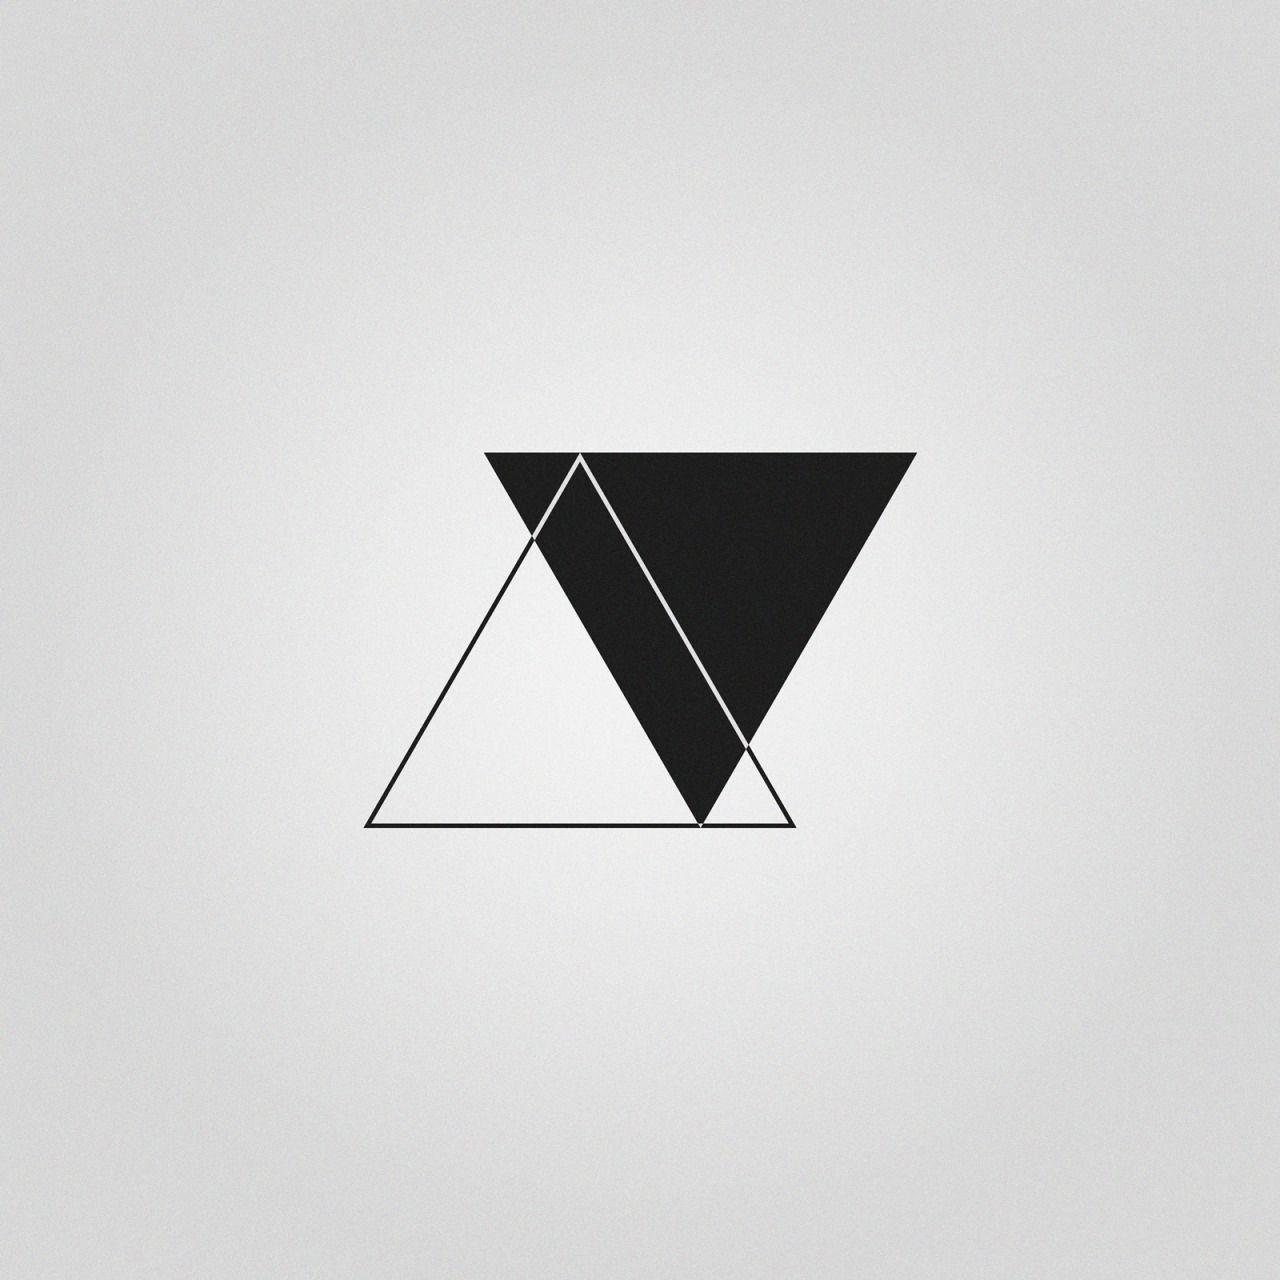 Tatto … … Tatto de irmãs, Tatuagem triângulo, Triangulo